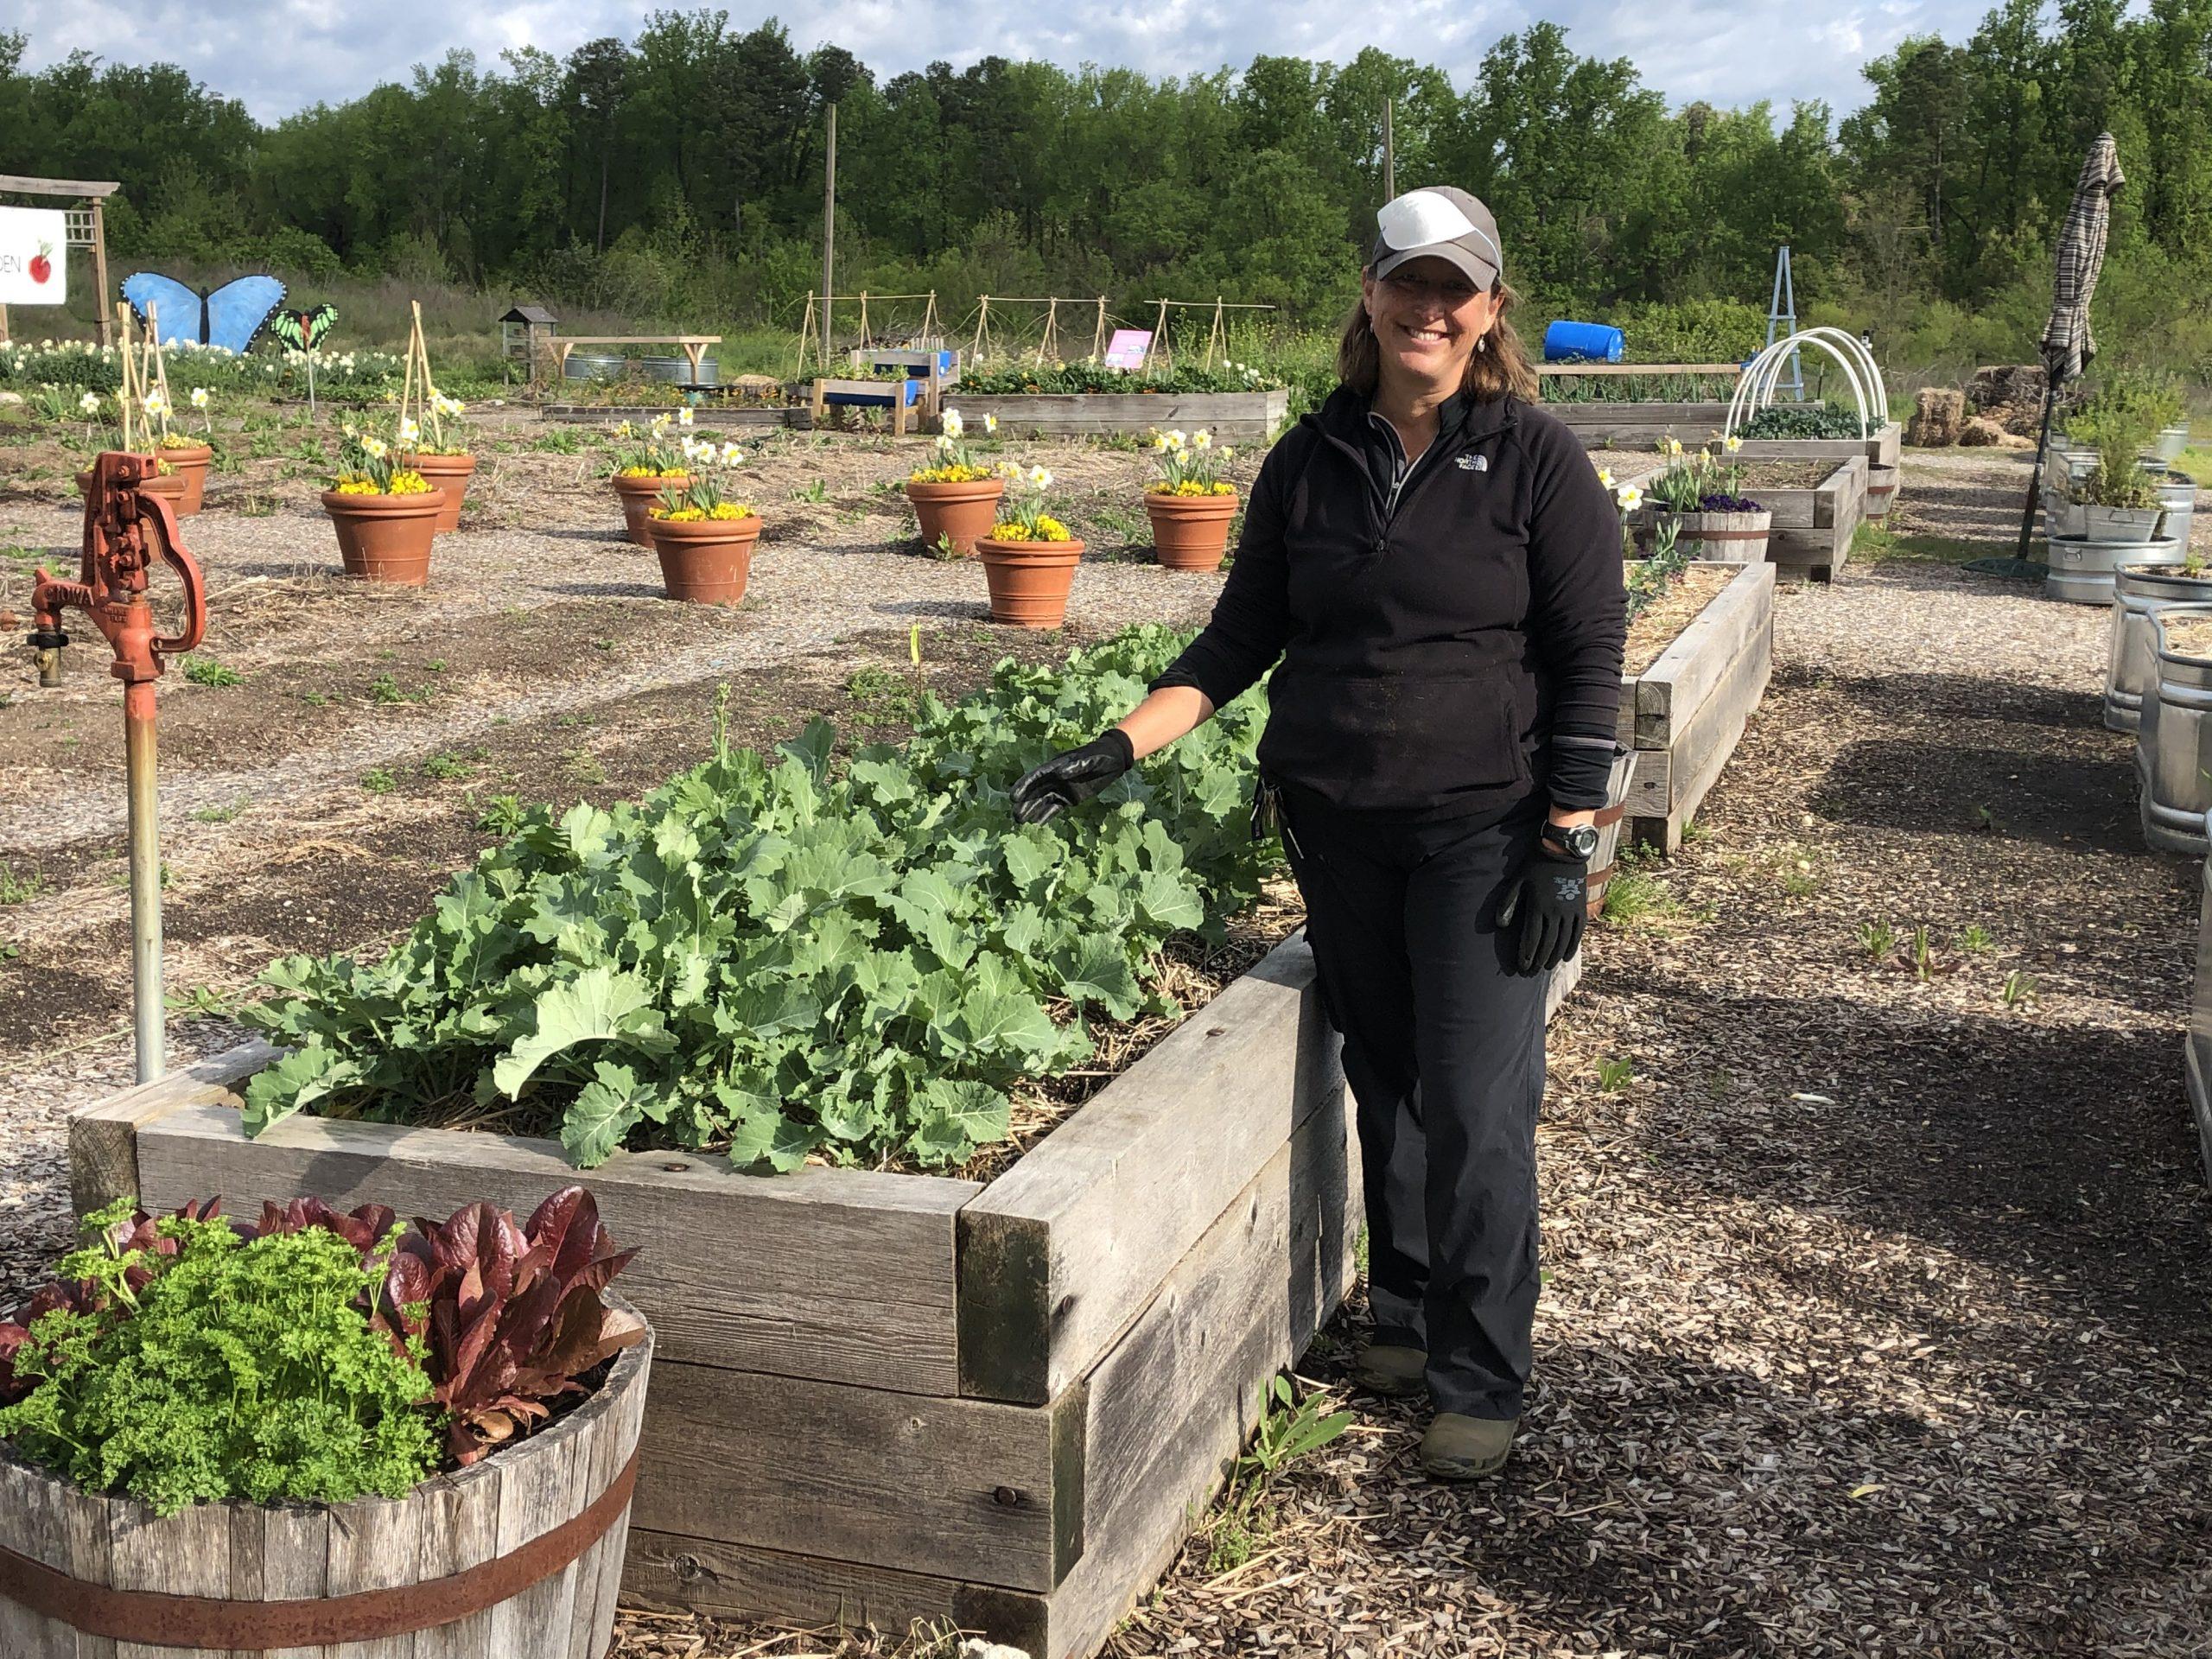 Senior Horticulturist Laurel Matthew offers tips for starting your vegetable garden